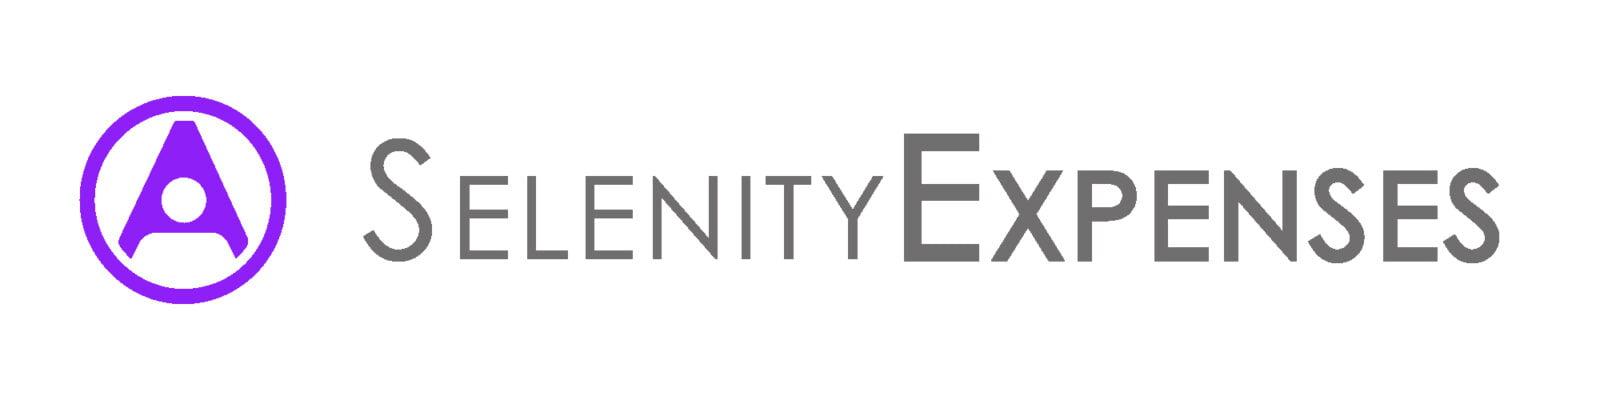 SelenityExpenses logo